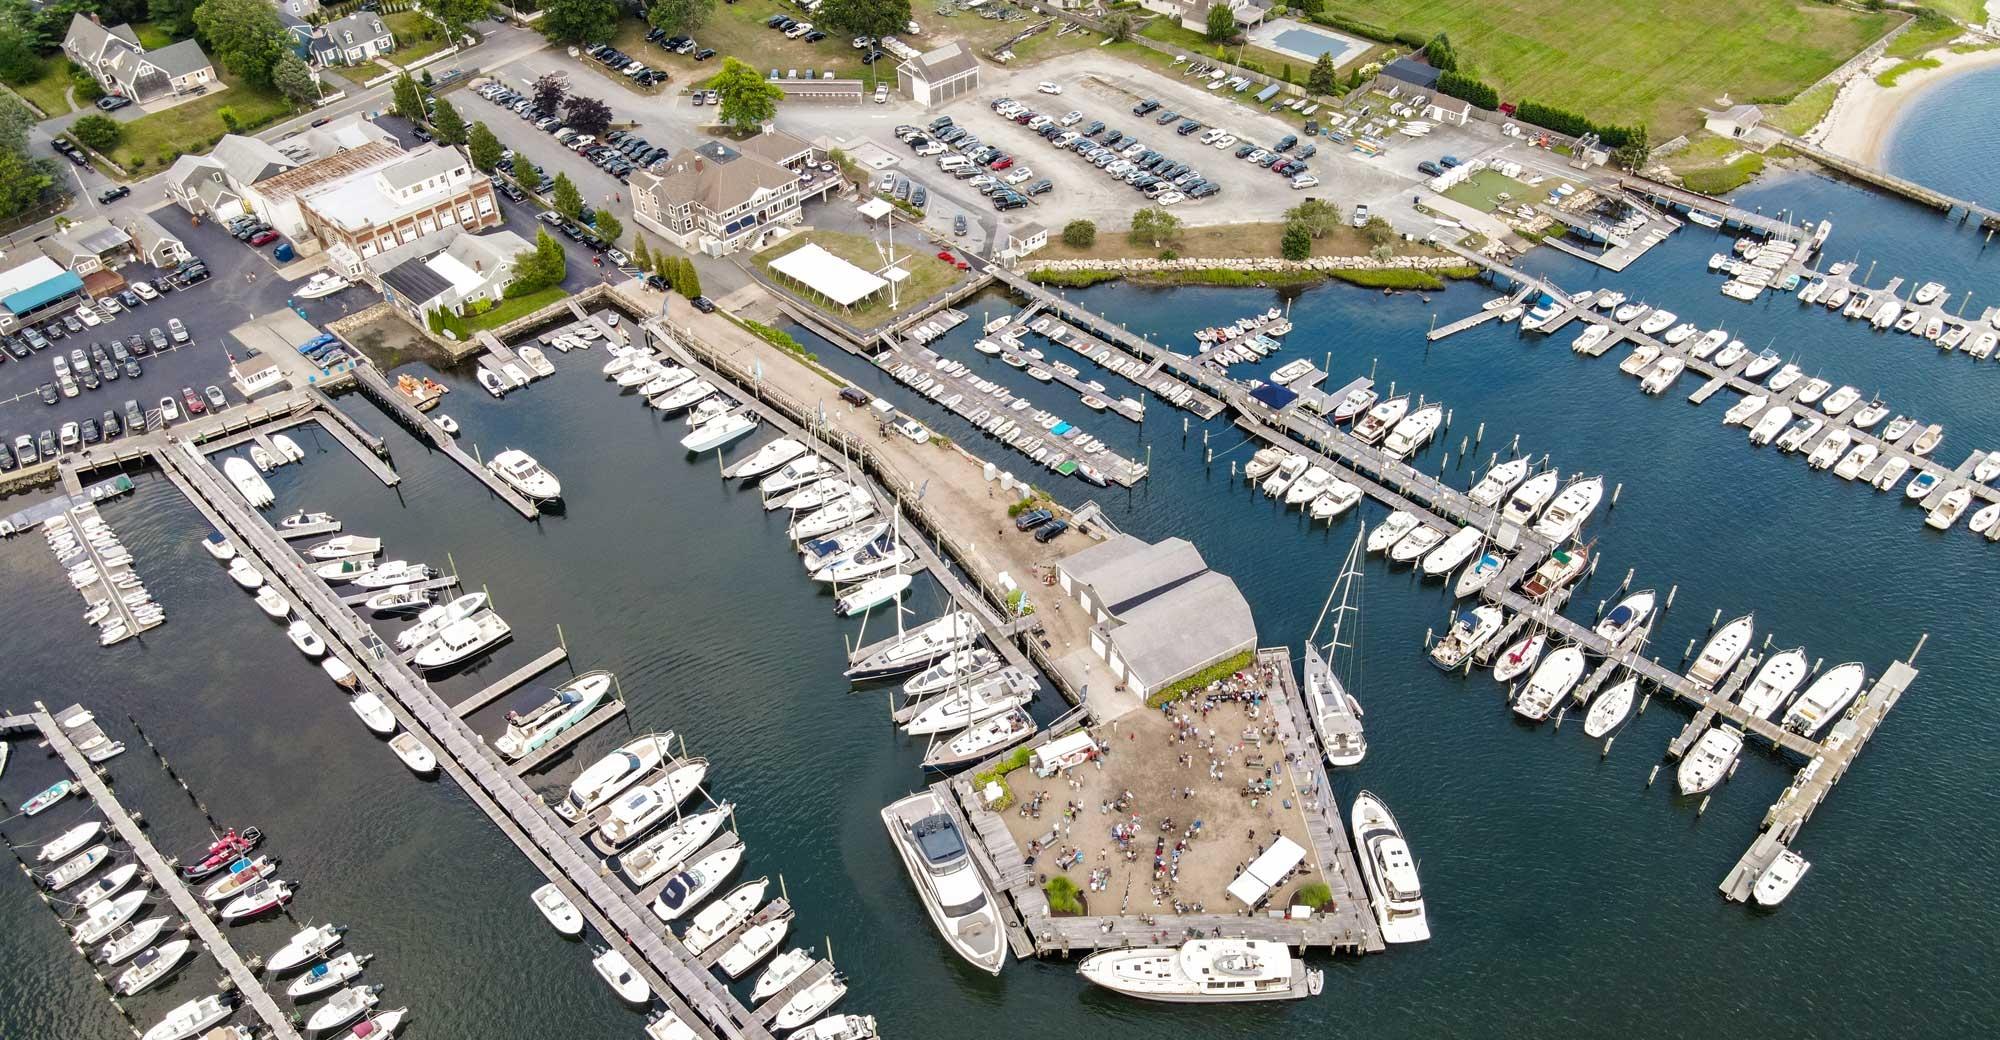 South_Wharf_Yacht_Yard_aerial_1-67F3.jpg